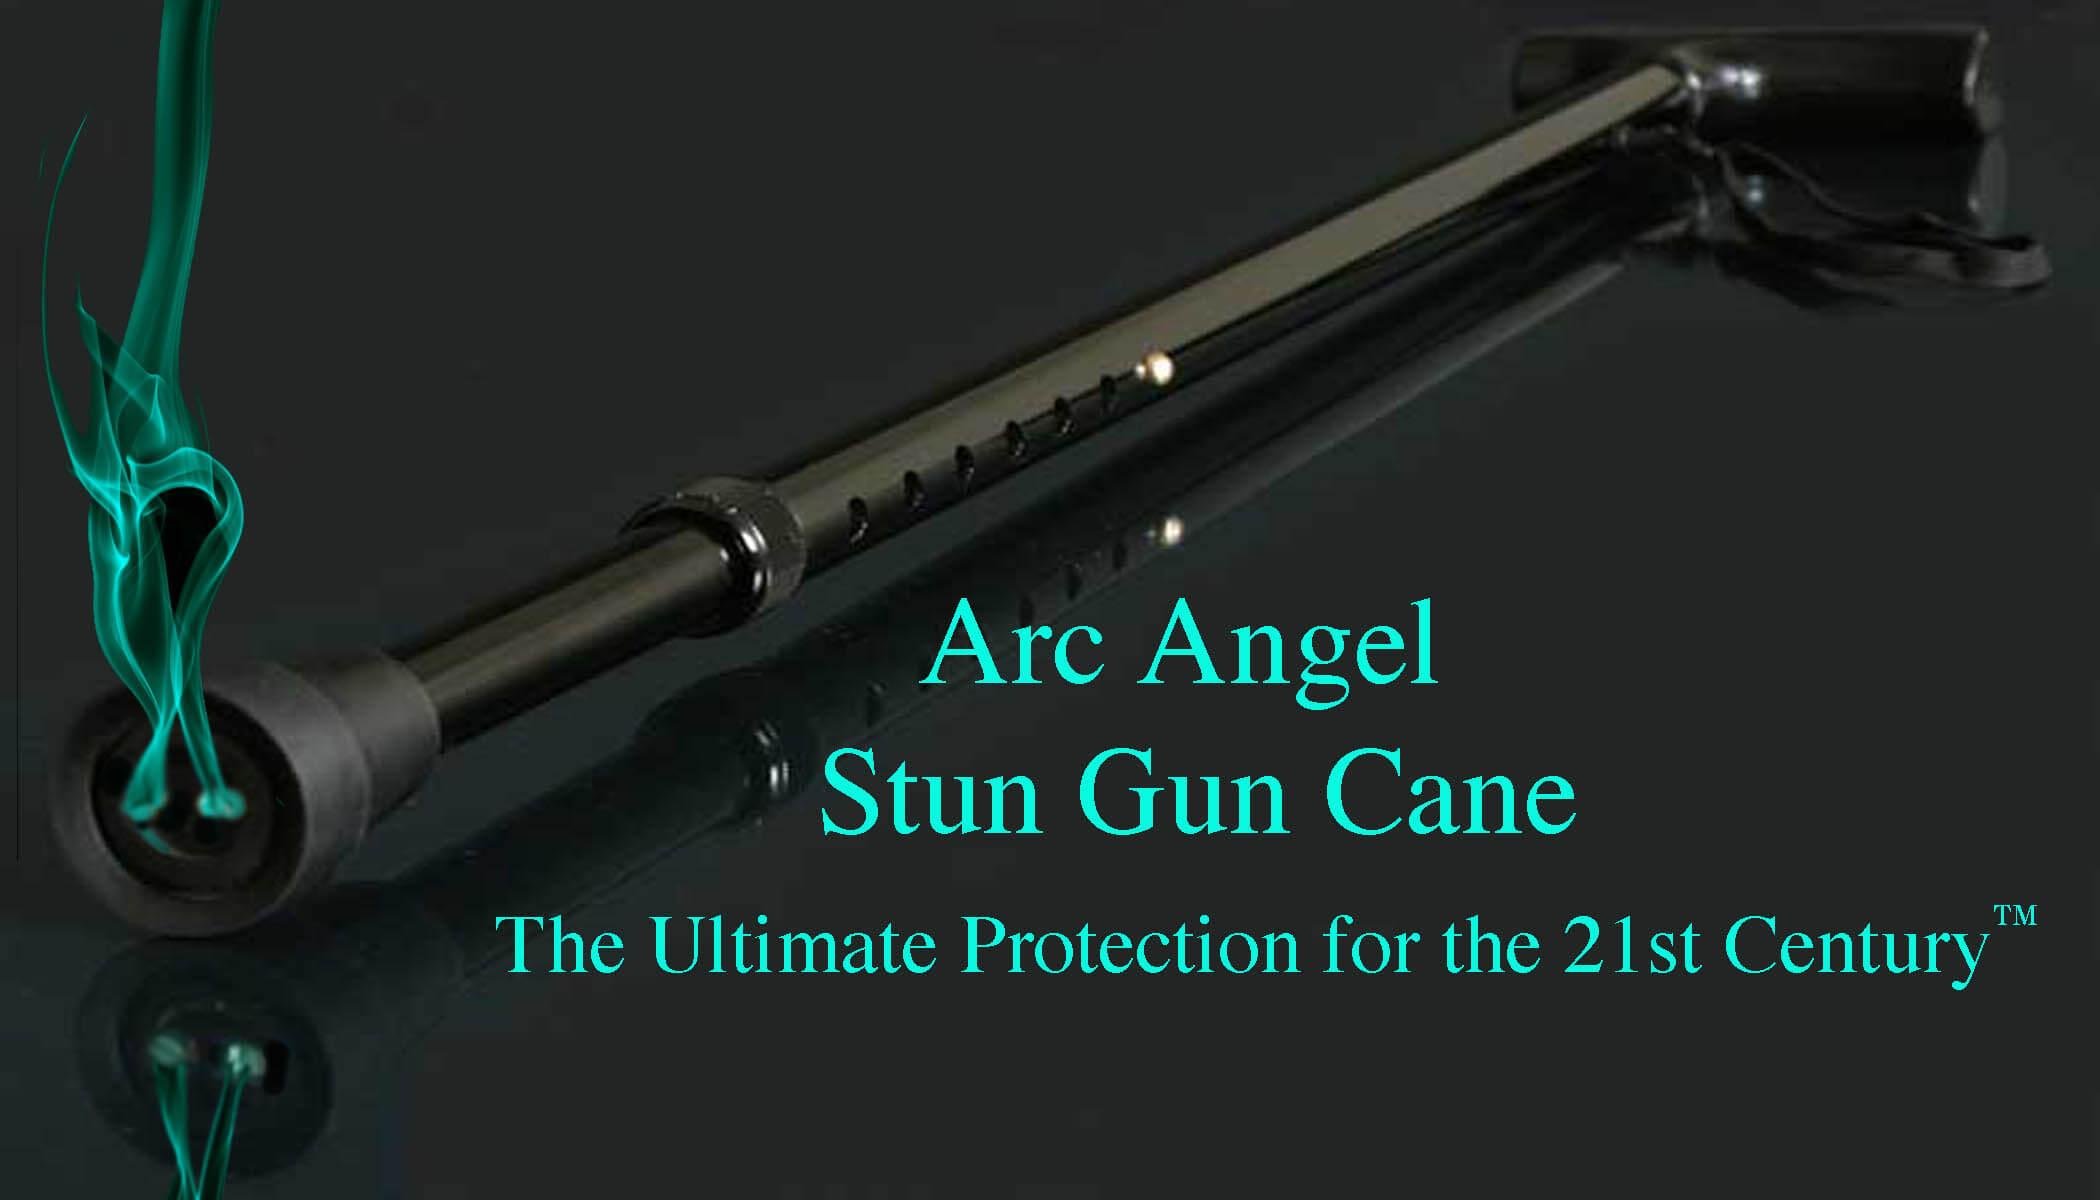 Arc Angel Stun Gun Cane